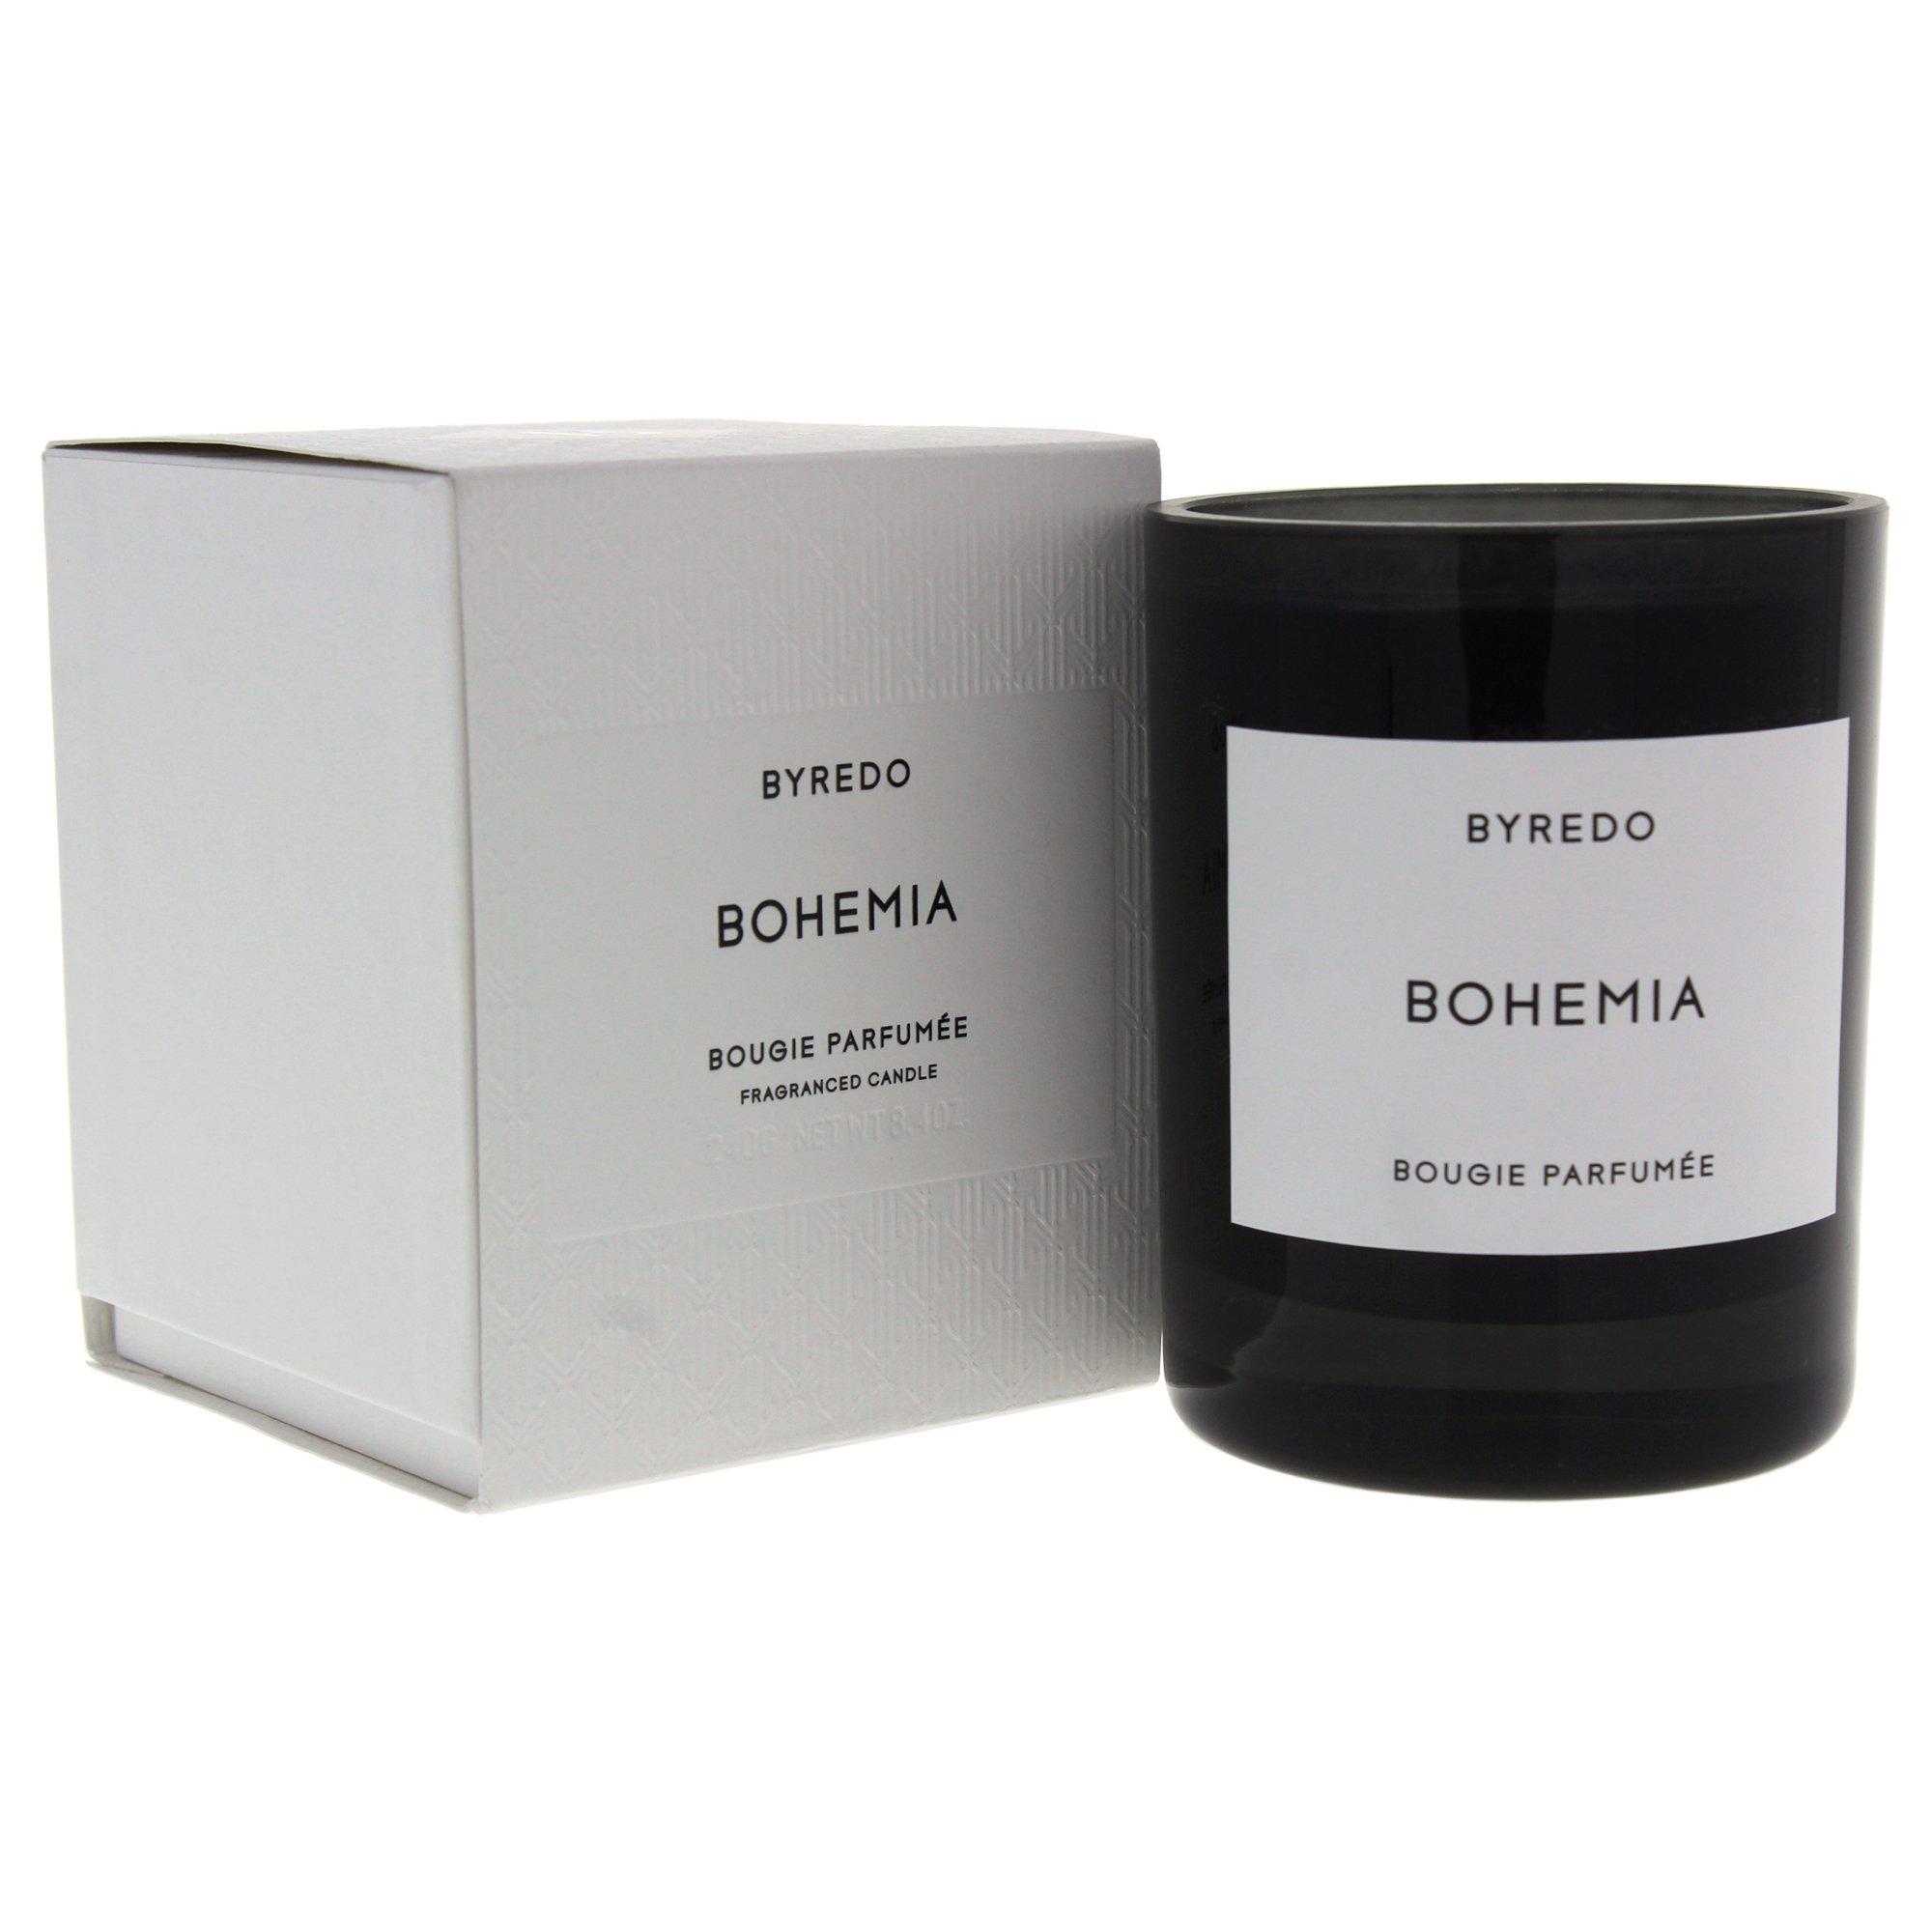 Byredo Scented Candle, Bohemia, 8.4 Ounce